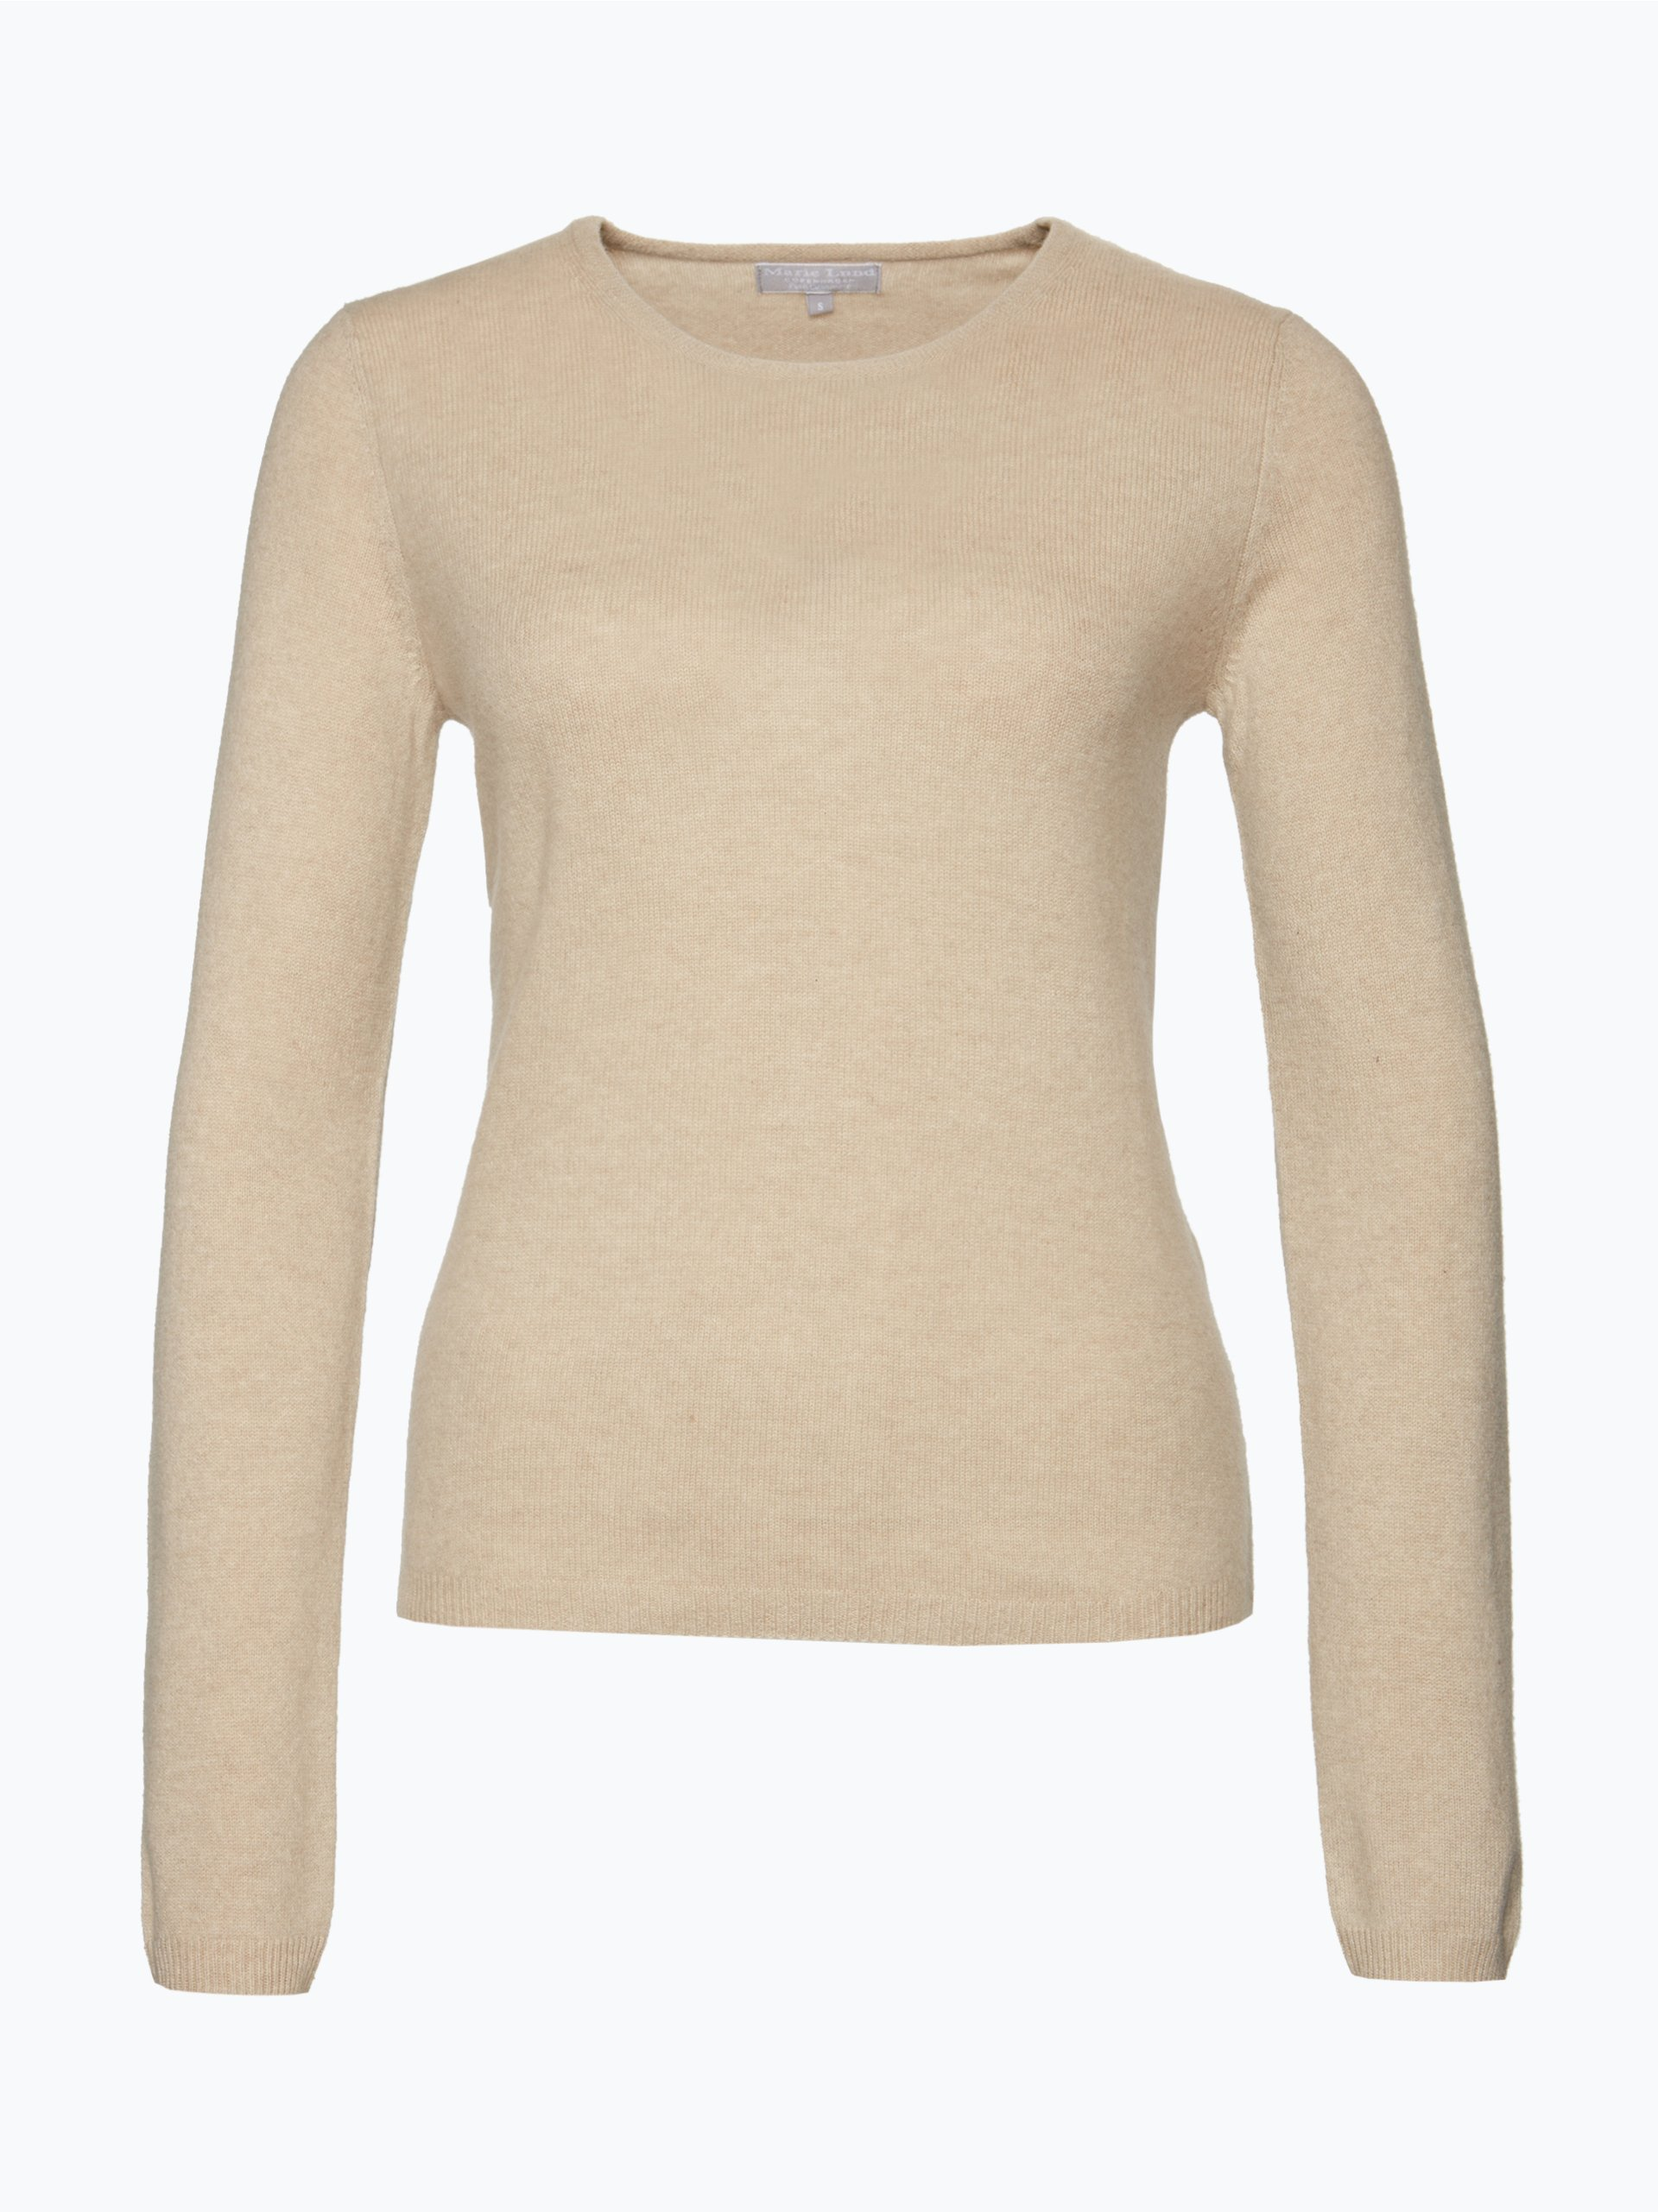 marie lund damen pure cashmere pullover taupe uni online kaufen vangraaf com. Black Bedroom Furniture Sets. Home Design Ideas